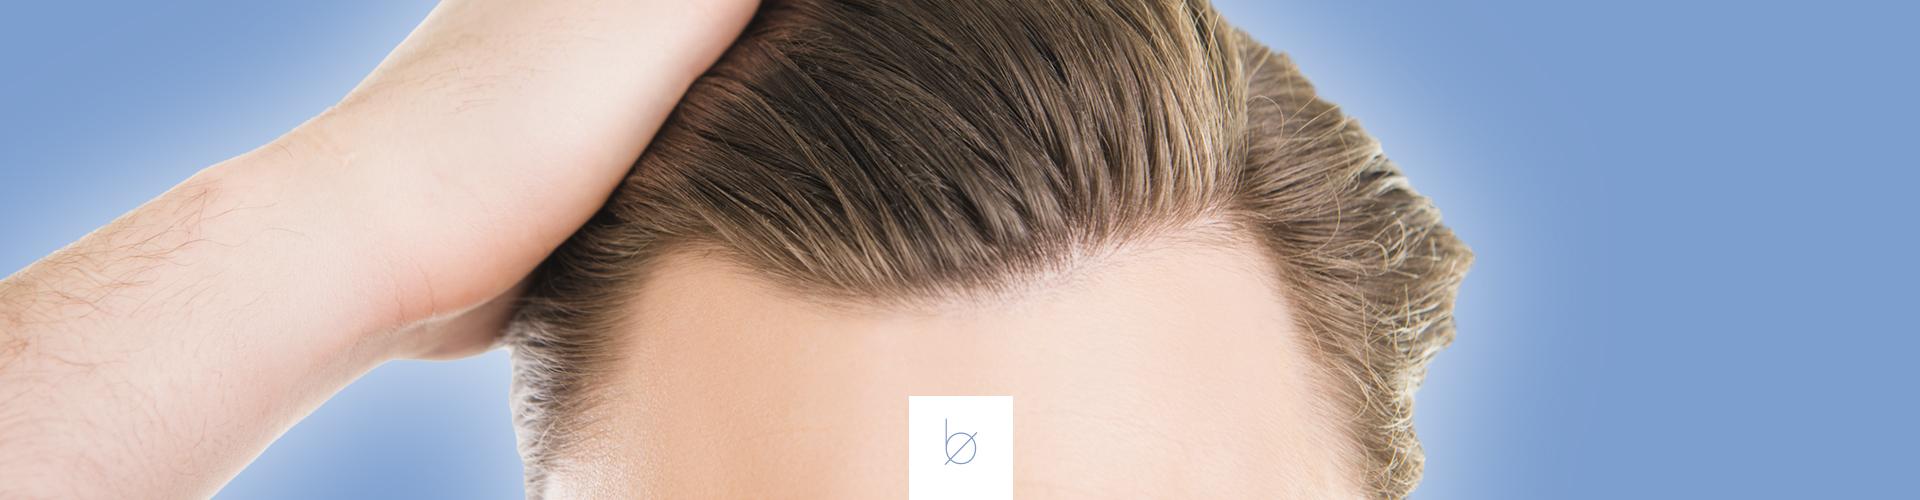 Frena la caída del cabello